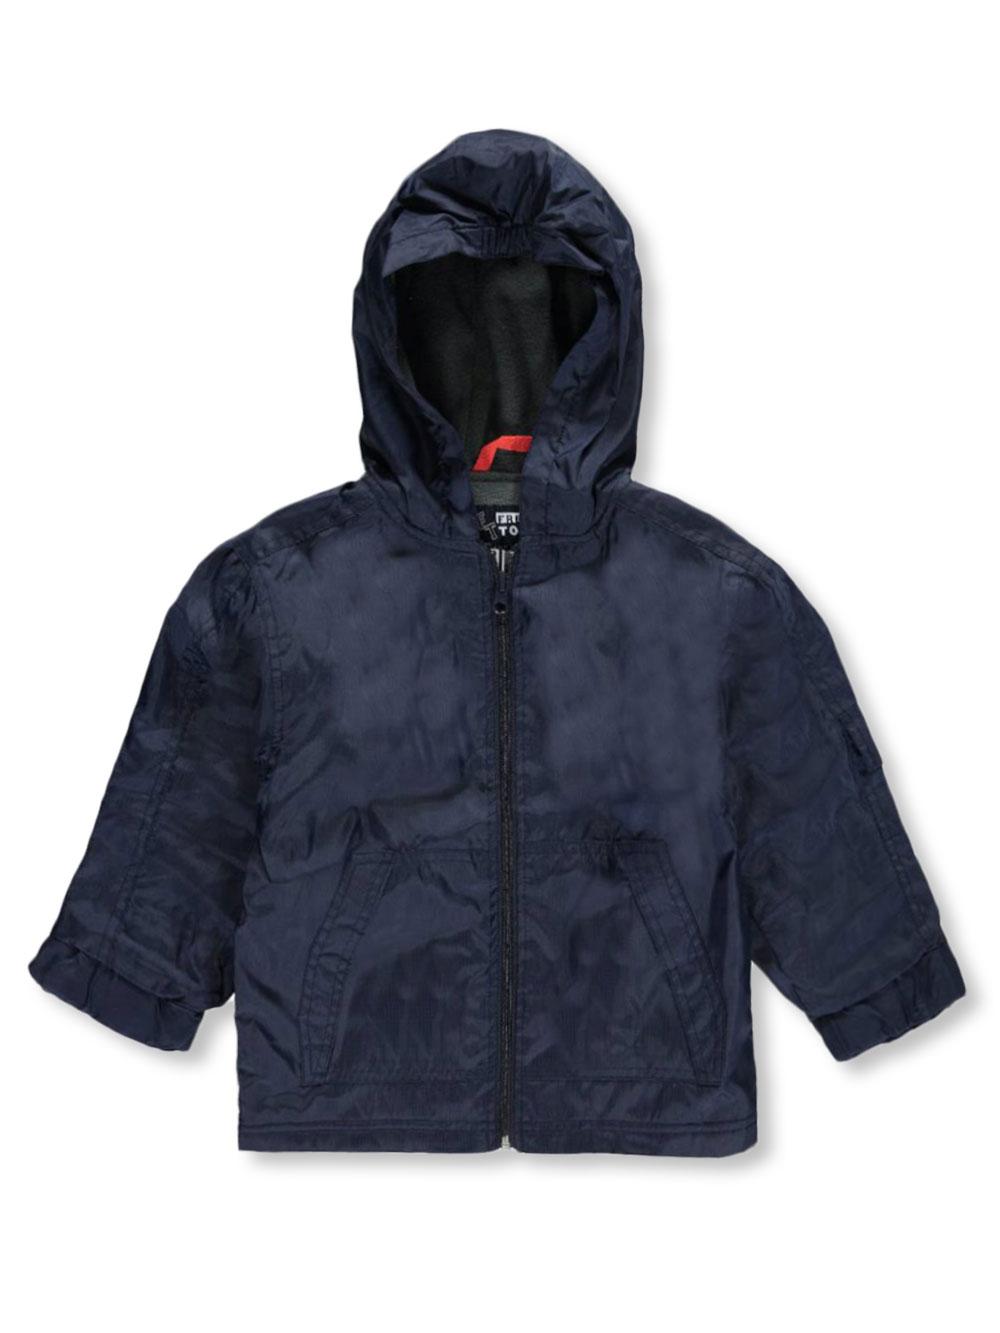 Image of French Toast School Uniform Little Boys Pocket Grid Rain Jacket Sizes 4  7  navy 4